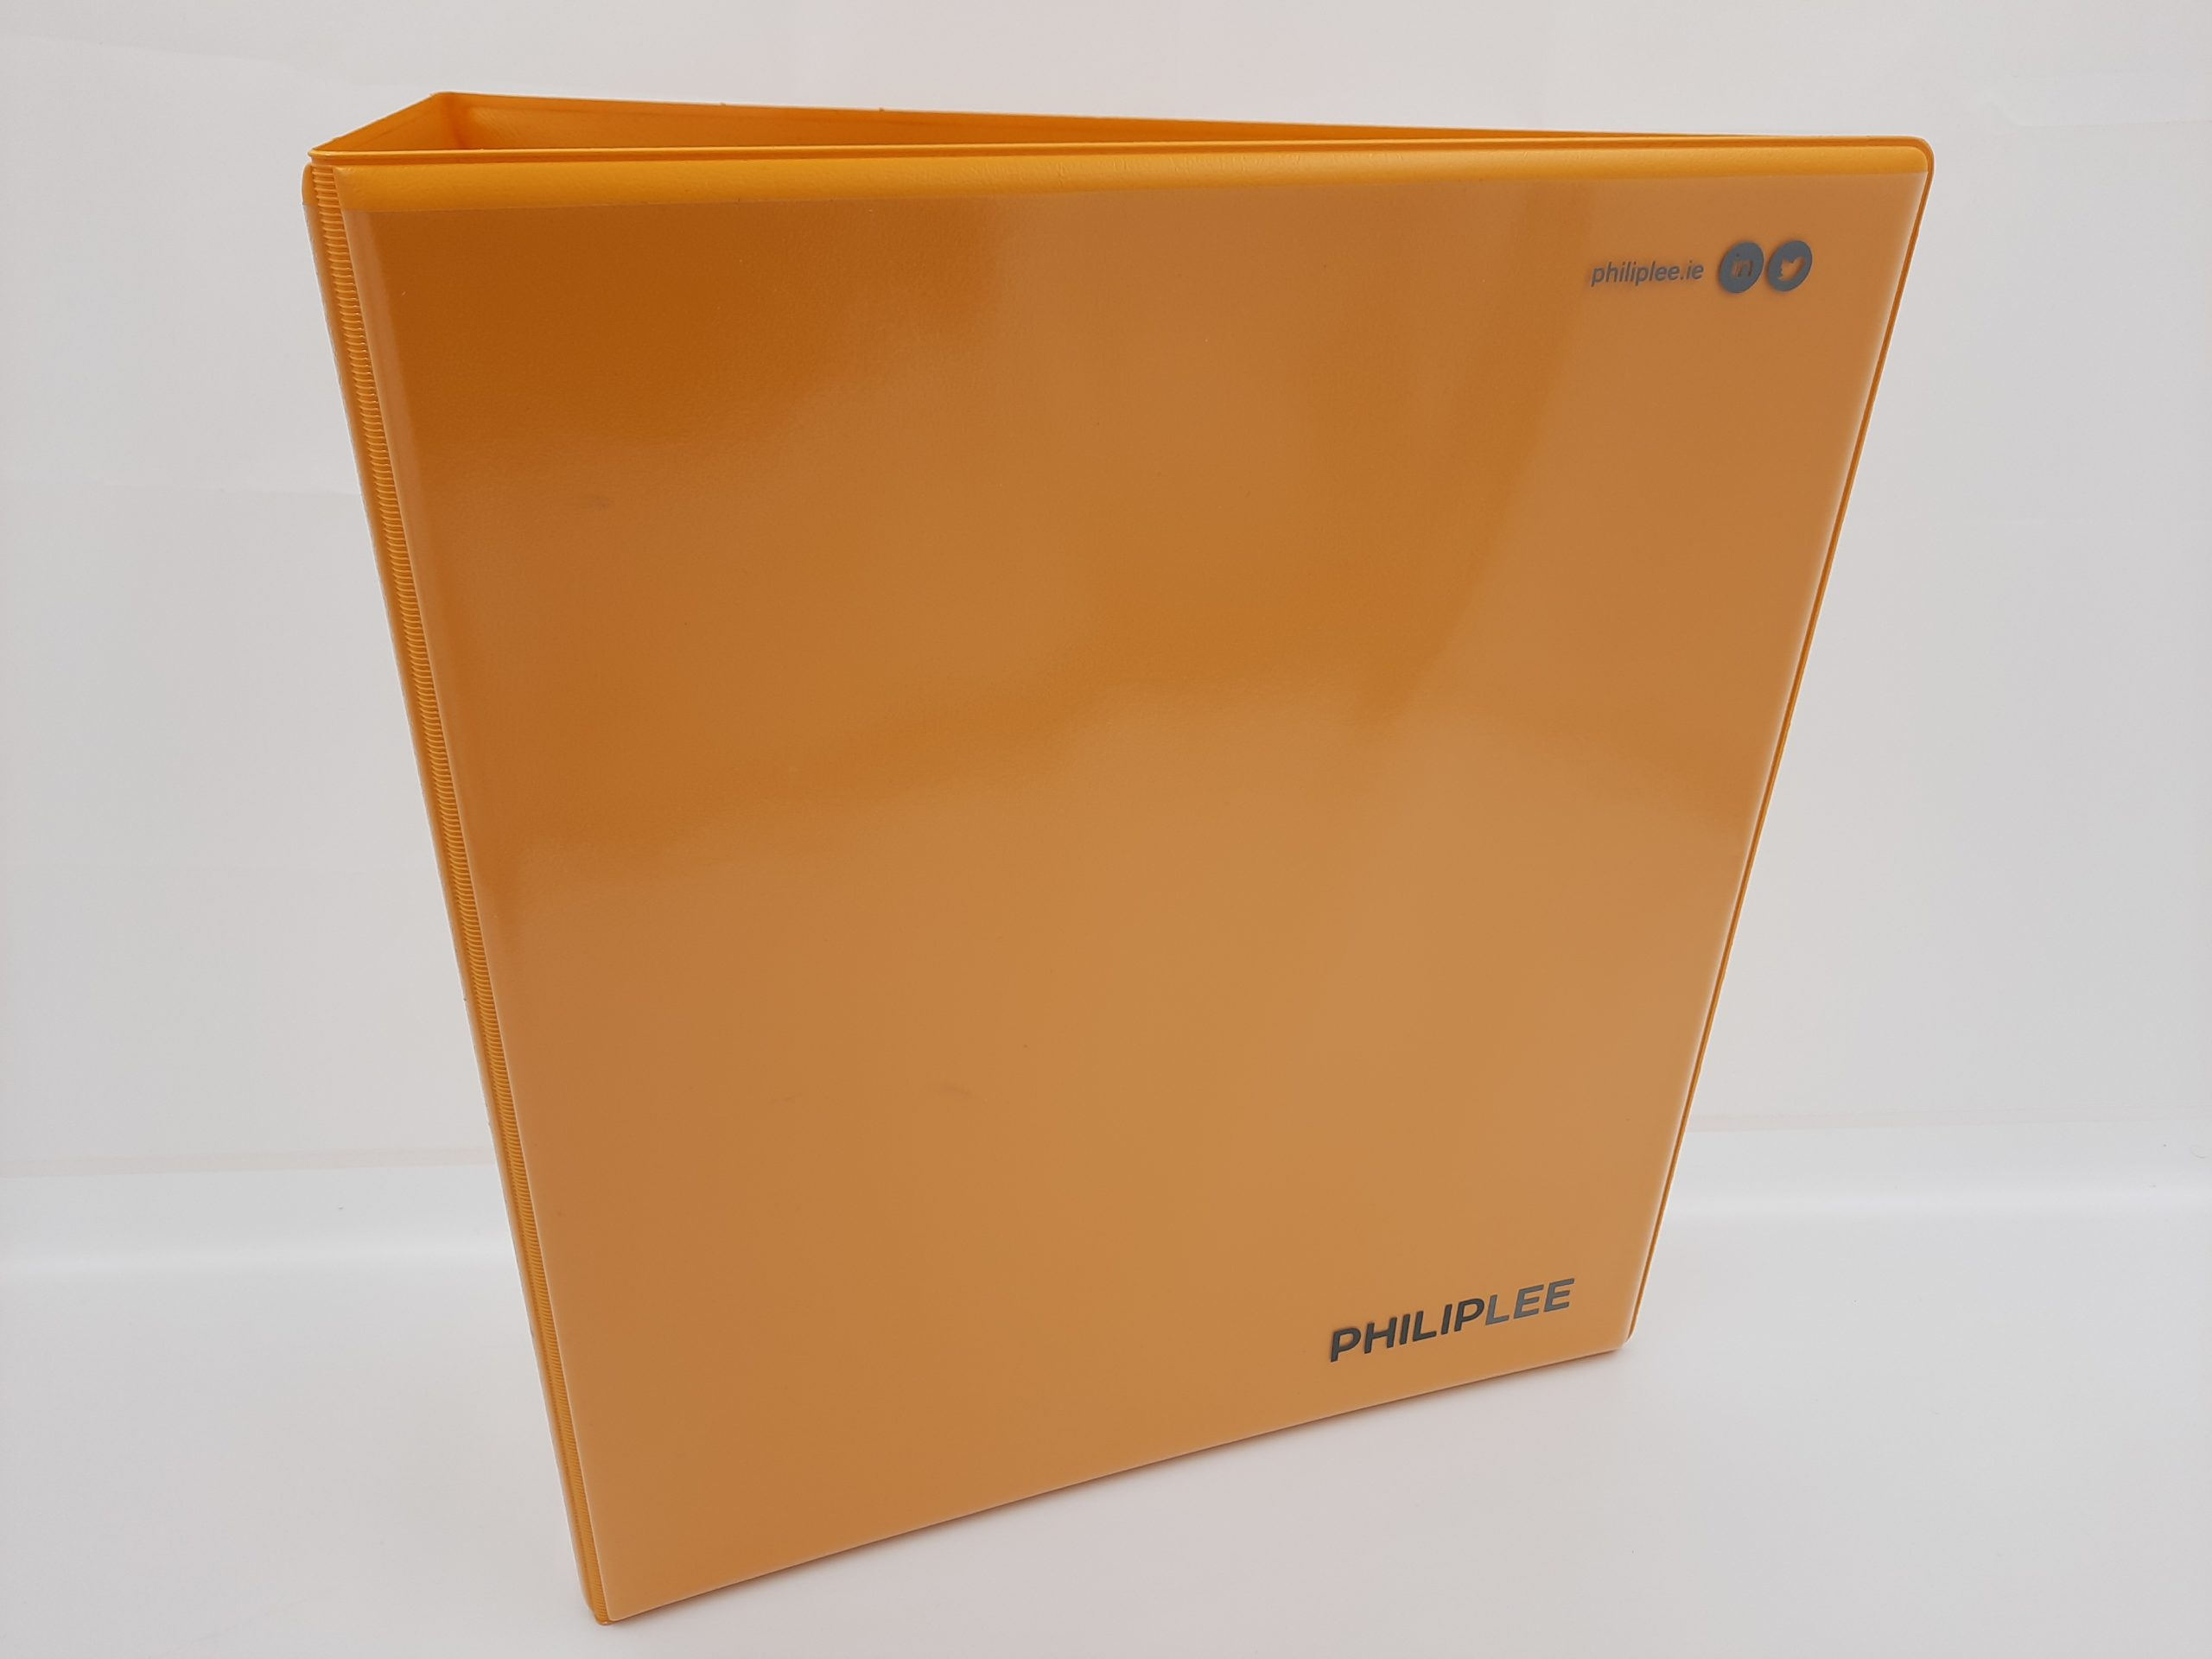 Philip Lee folder